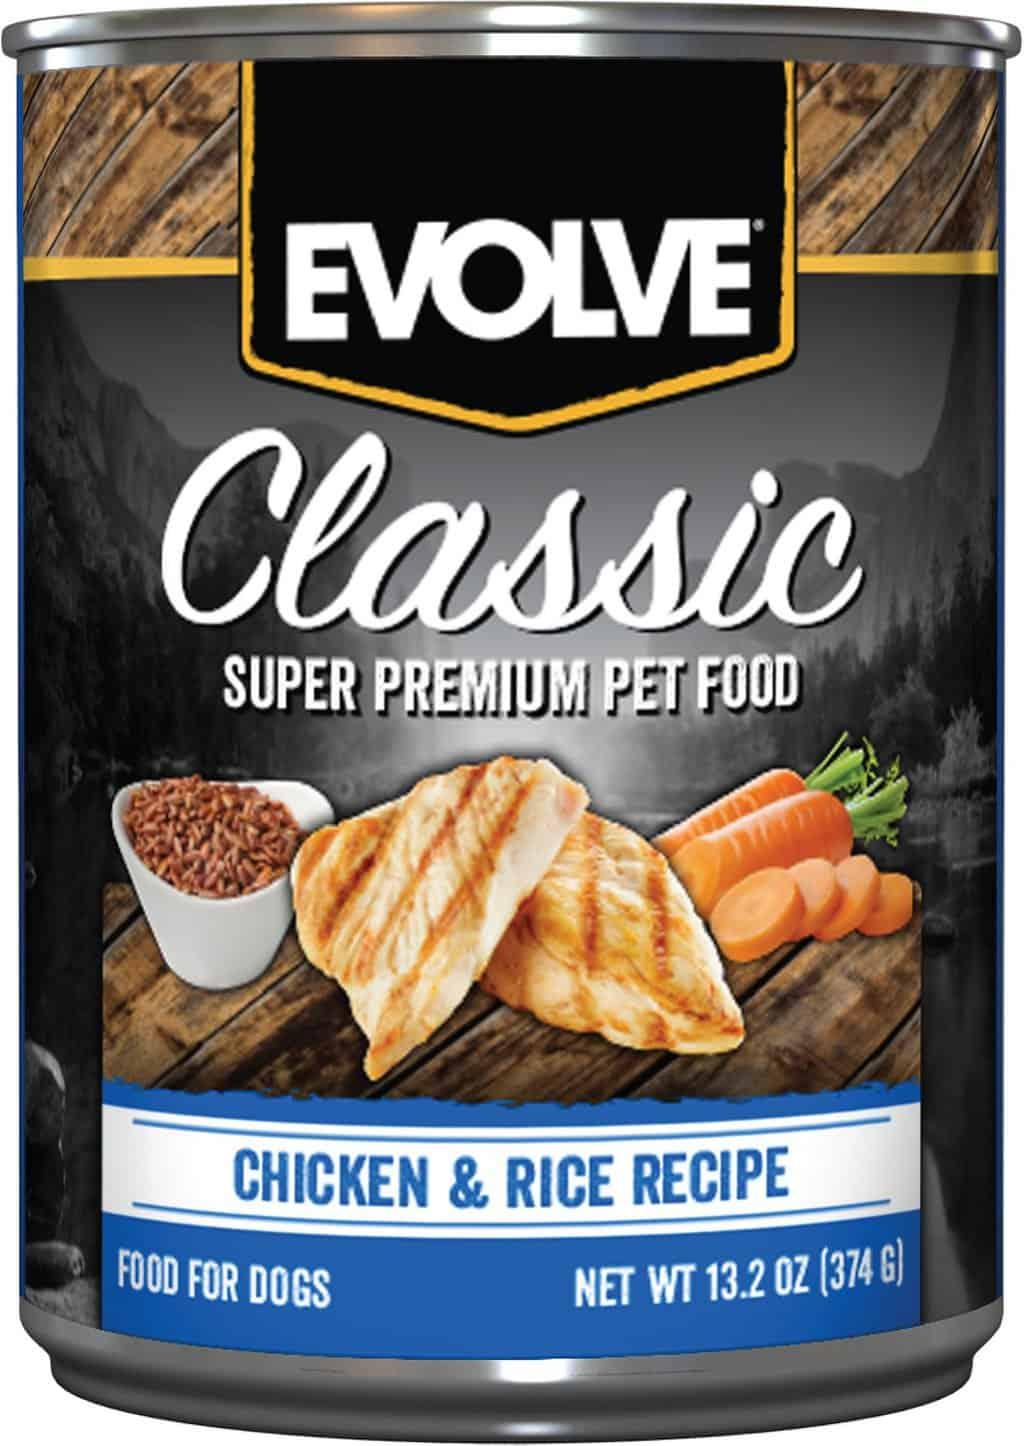 Evolve Dog Food Reviews [year]: Best Affordable, Premium Pet Food? 23